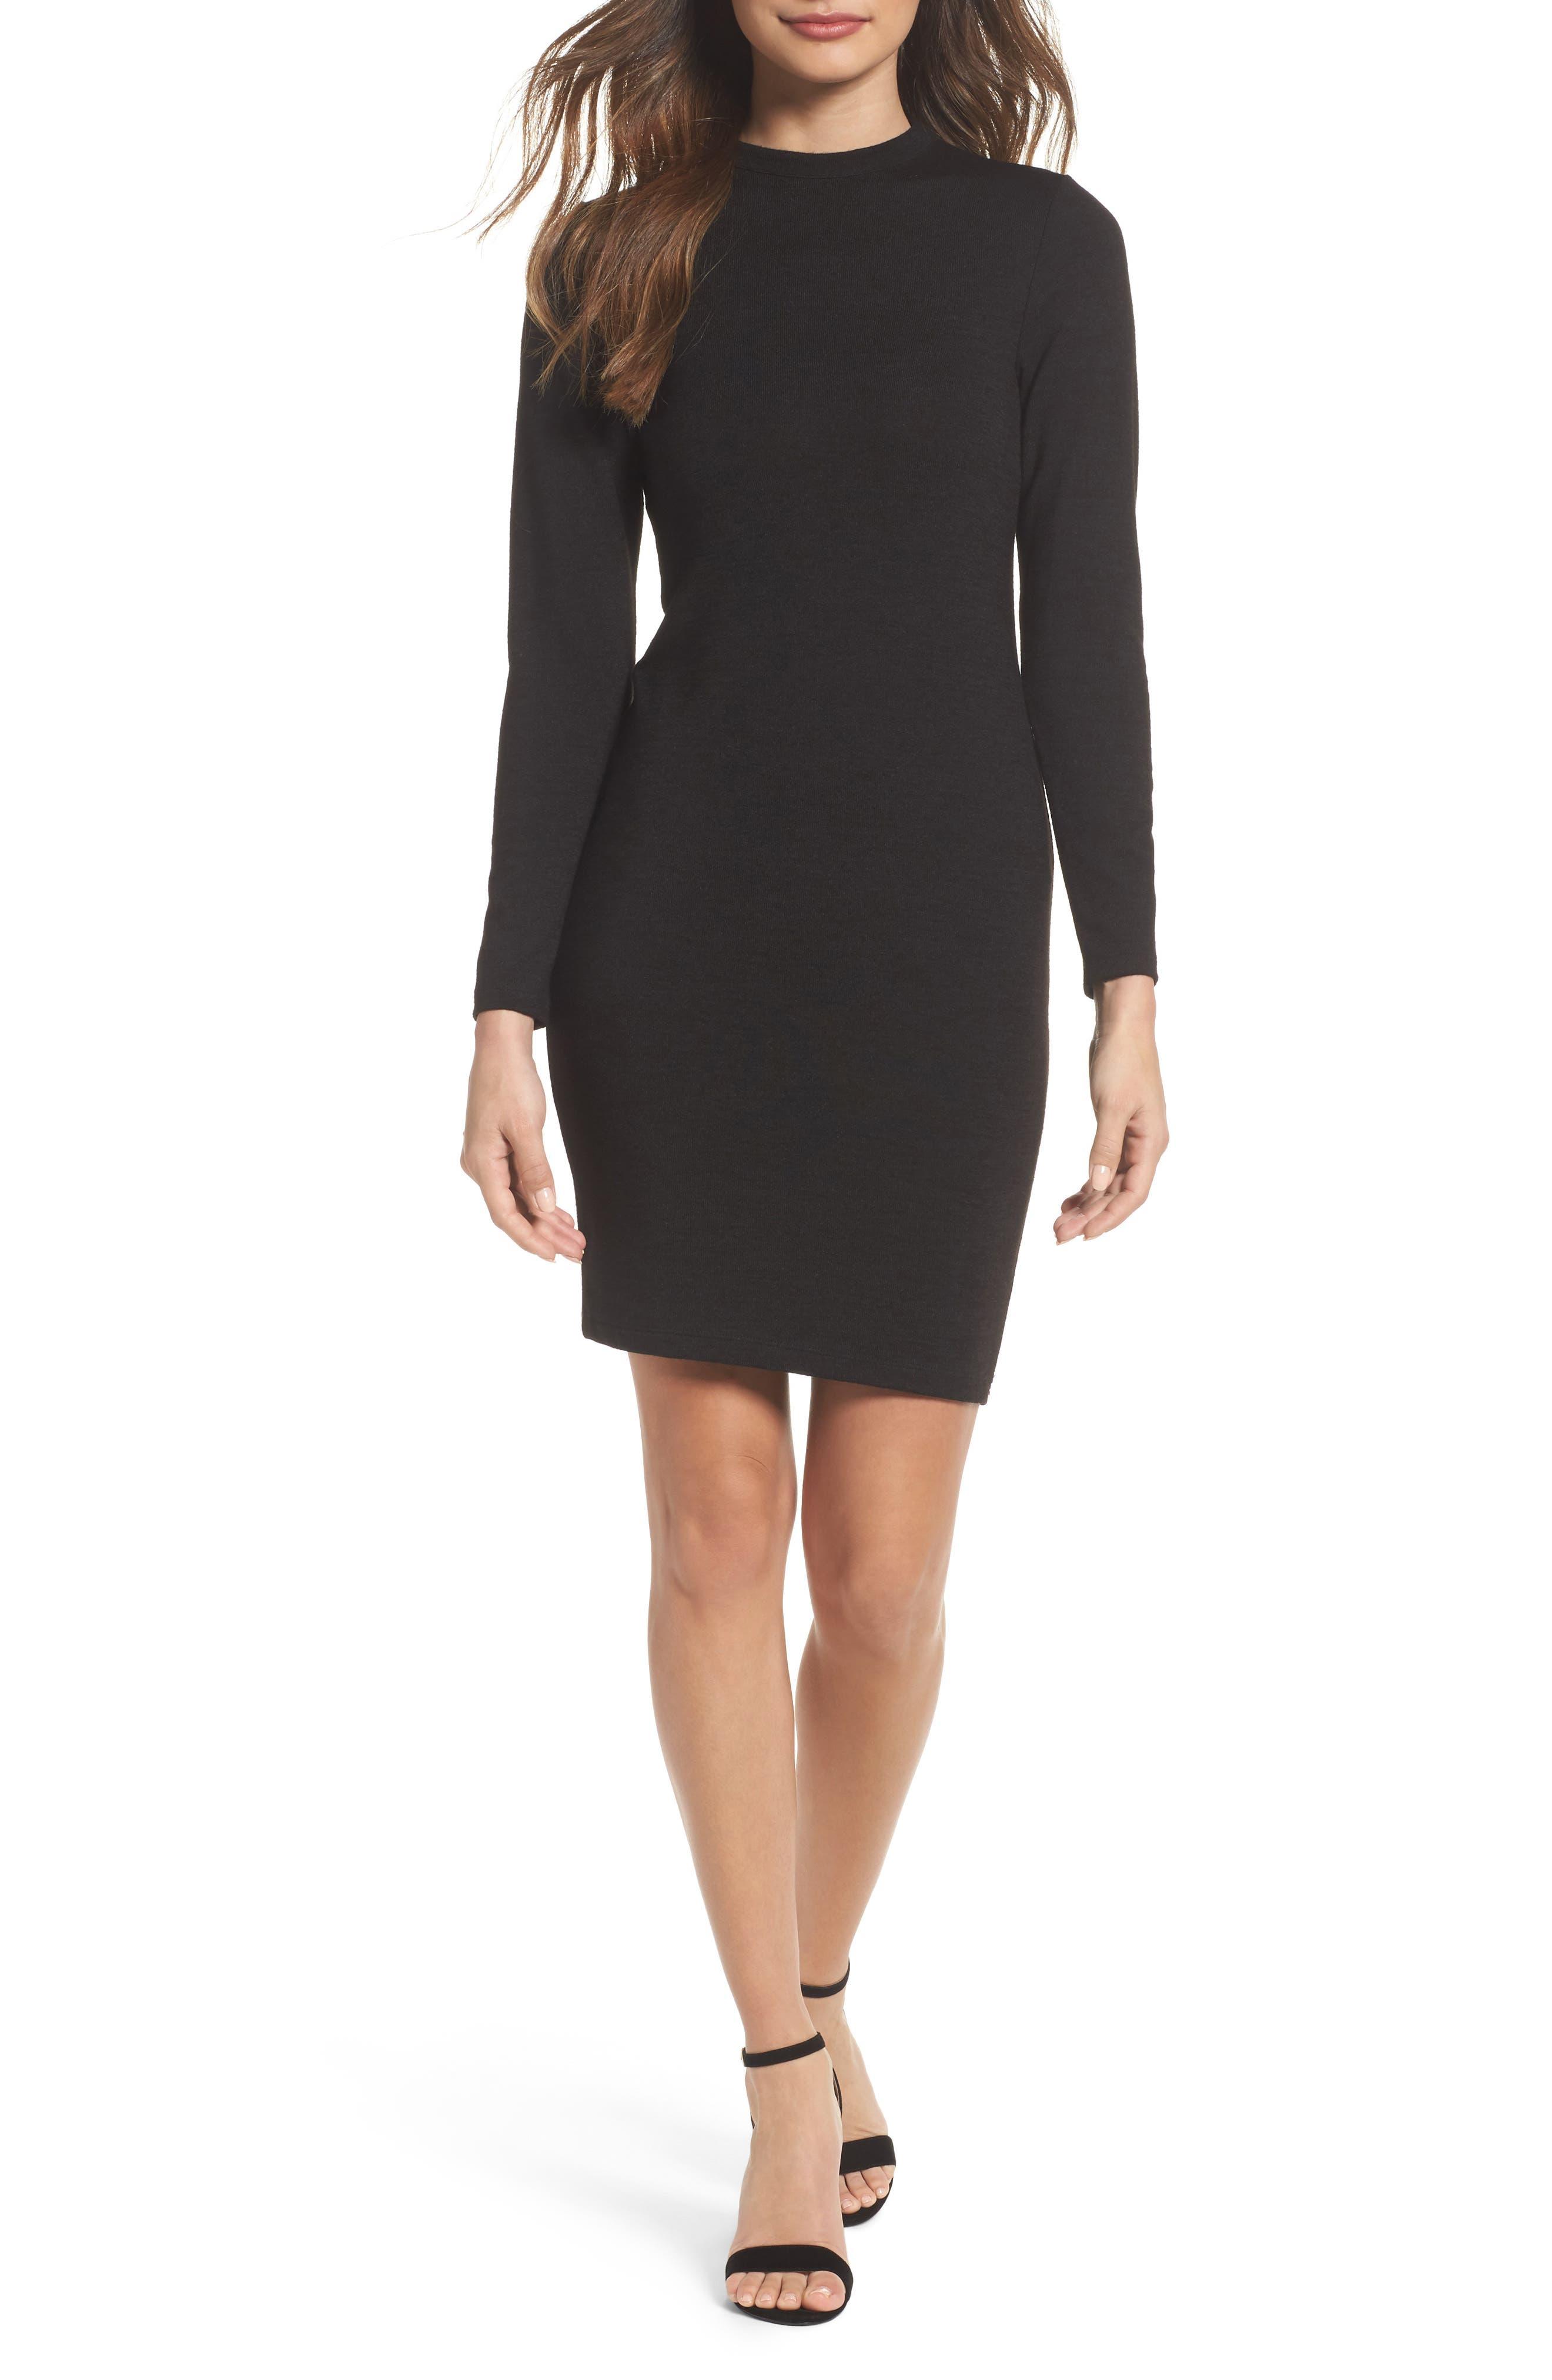 Zara black dress with zips dry cleaning